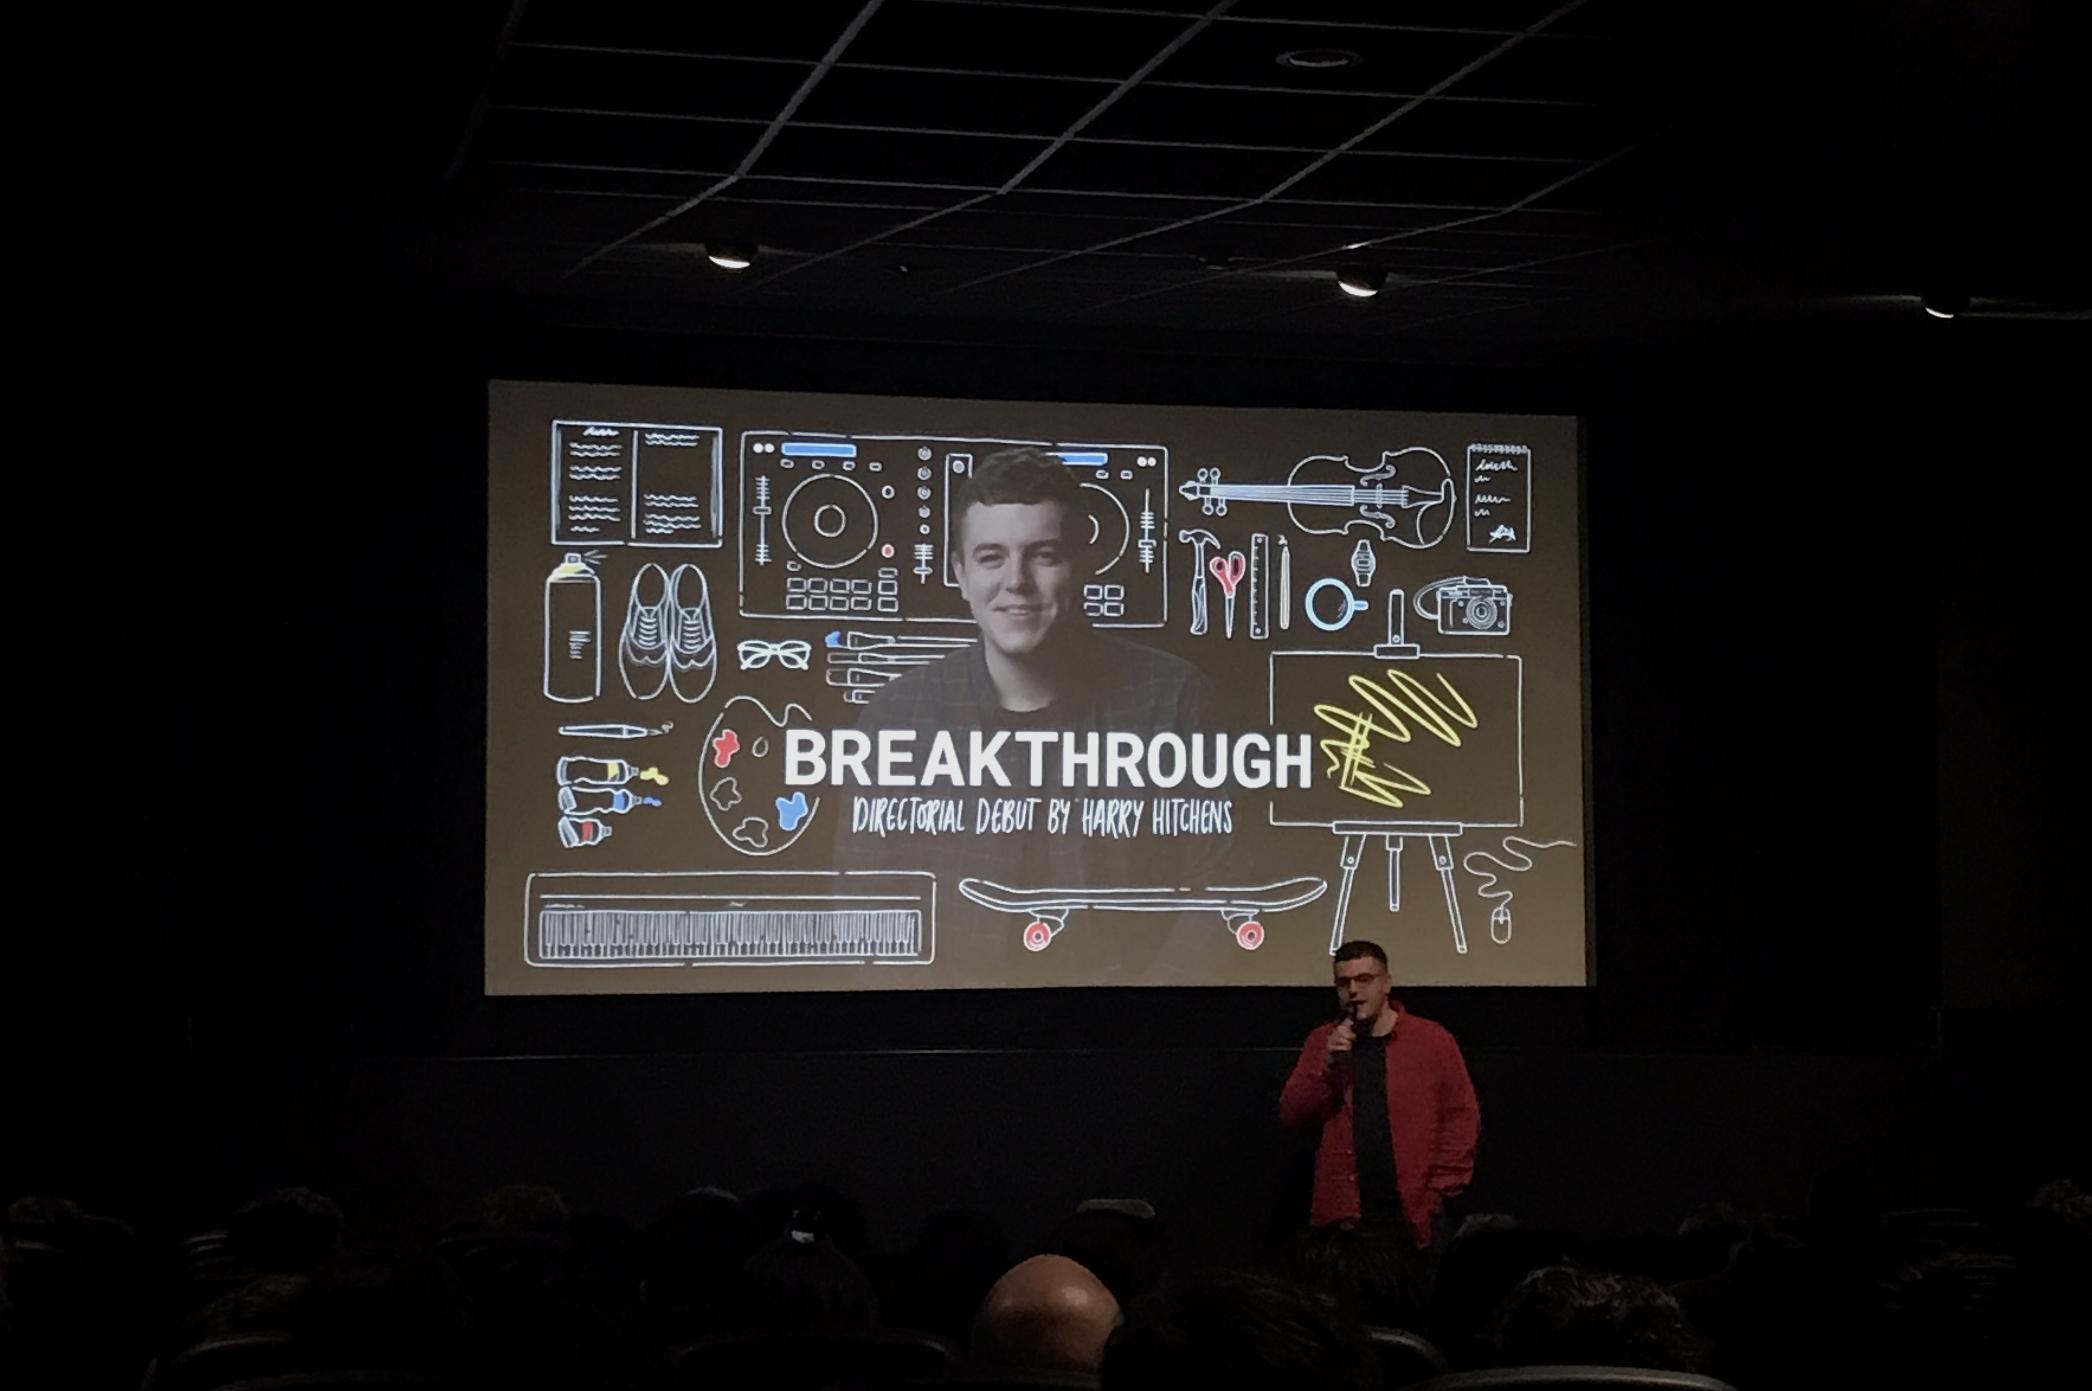 breakthrough-cinema.JPG